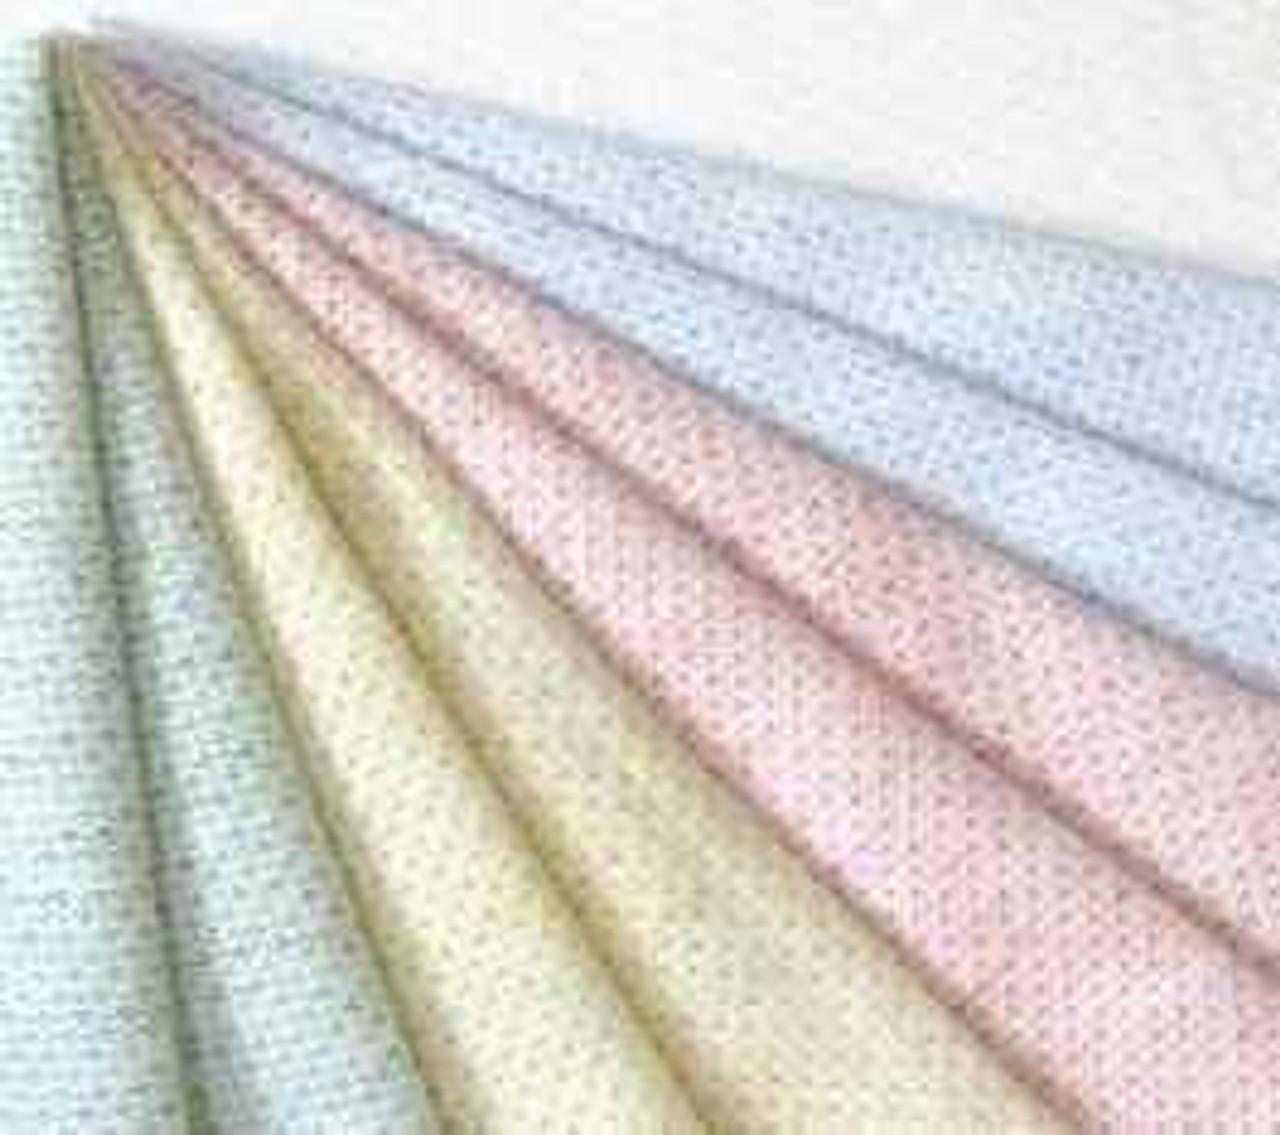 Flat Top Sheet or HealthMesh knit fabric or 53 x 104 or 1 dz